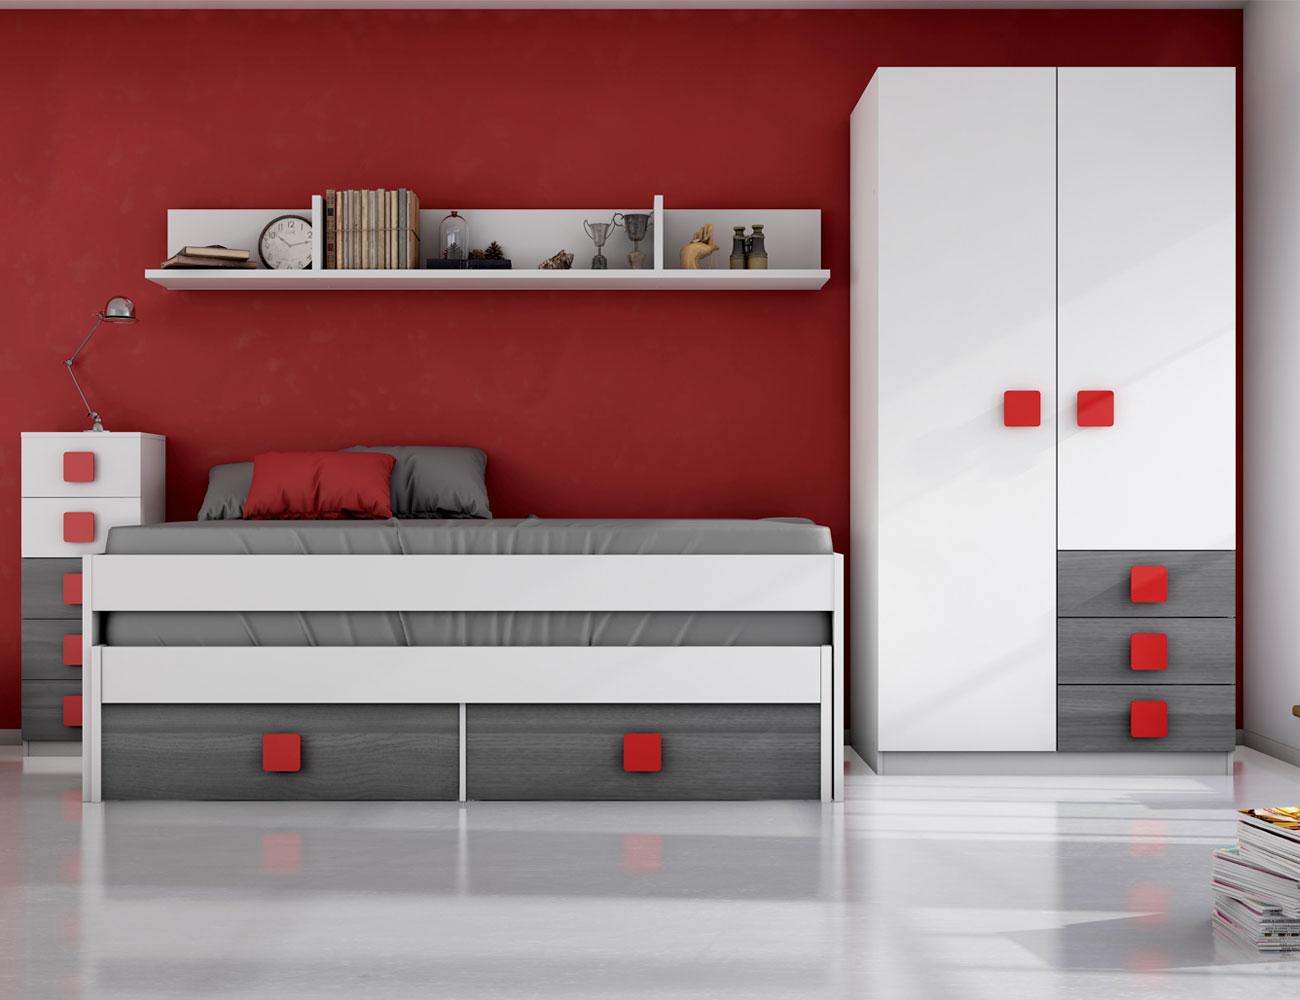 Dormitorio juvenil ceniza rojo4